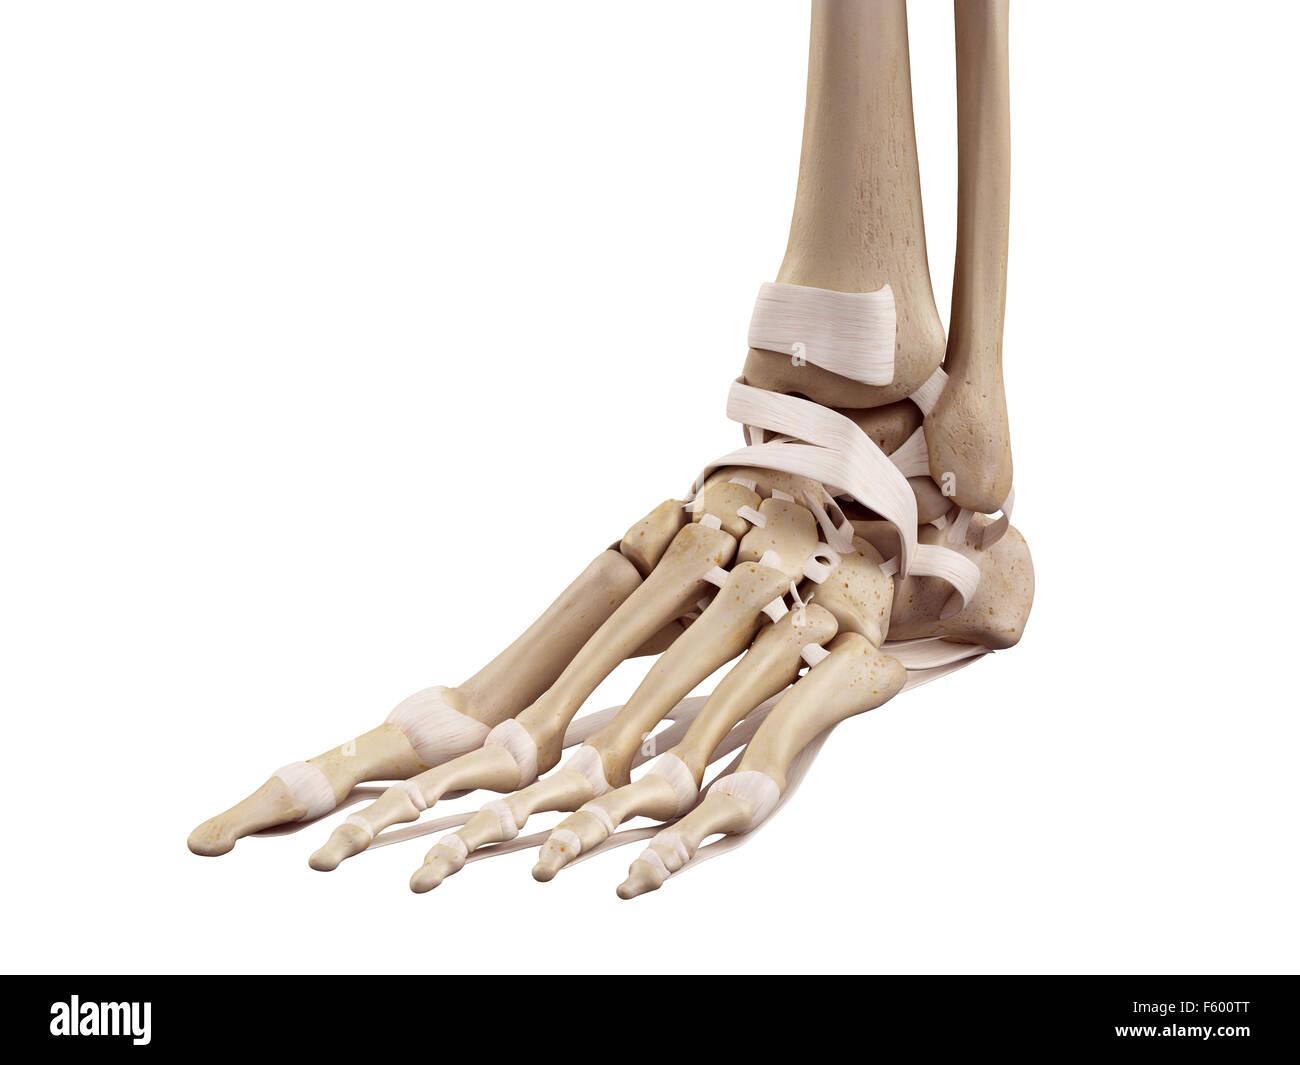 Human Foot Ligaments Stock Photos Human Foot Ligaments Stock